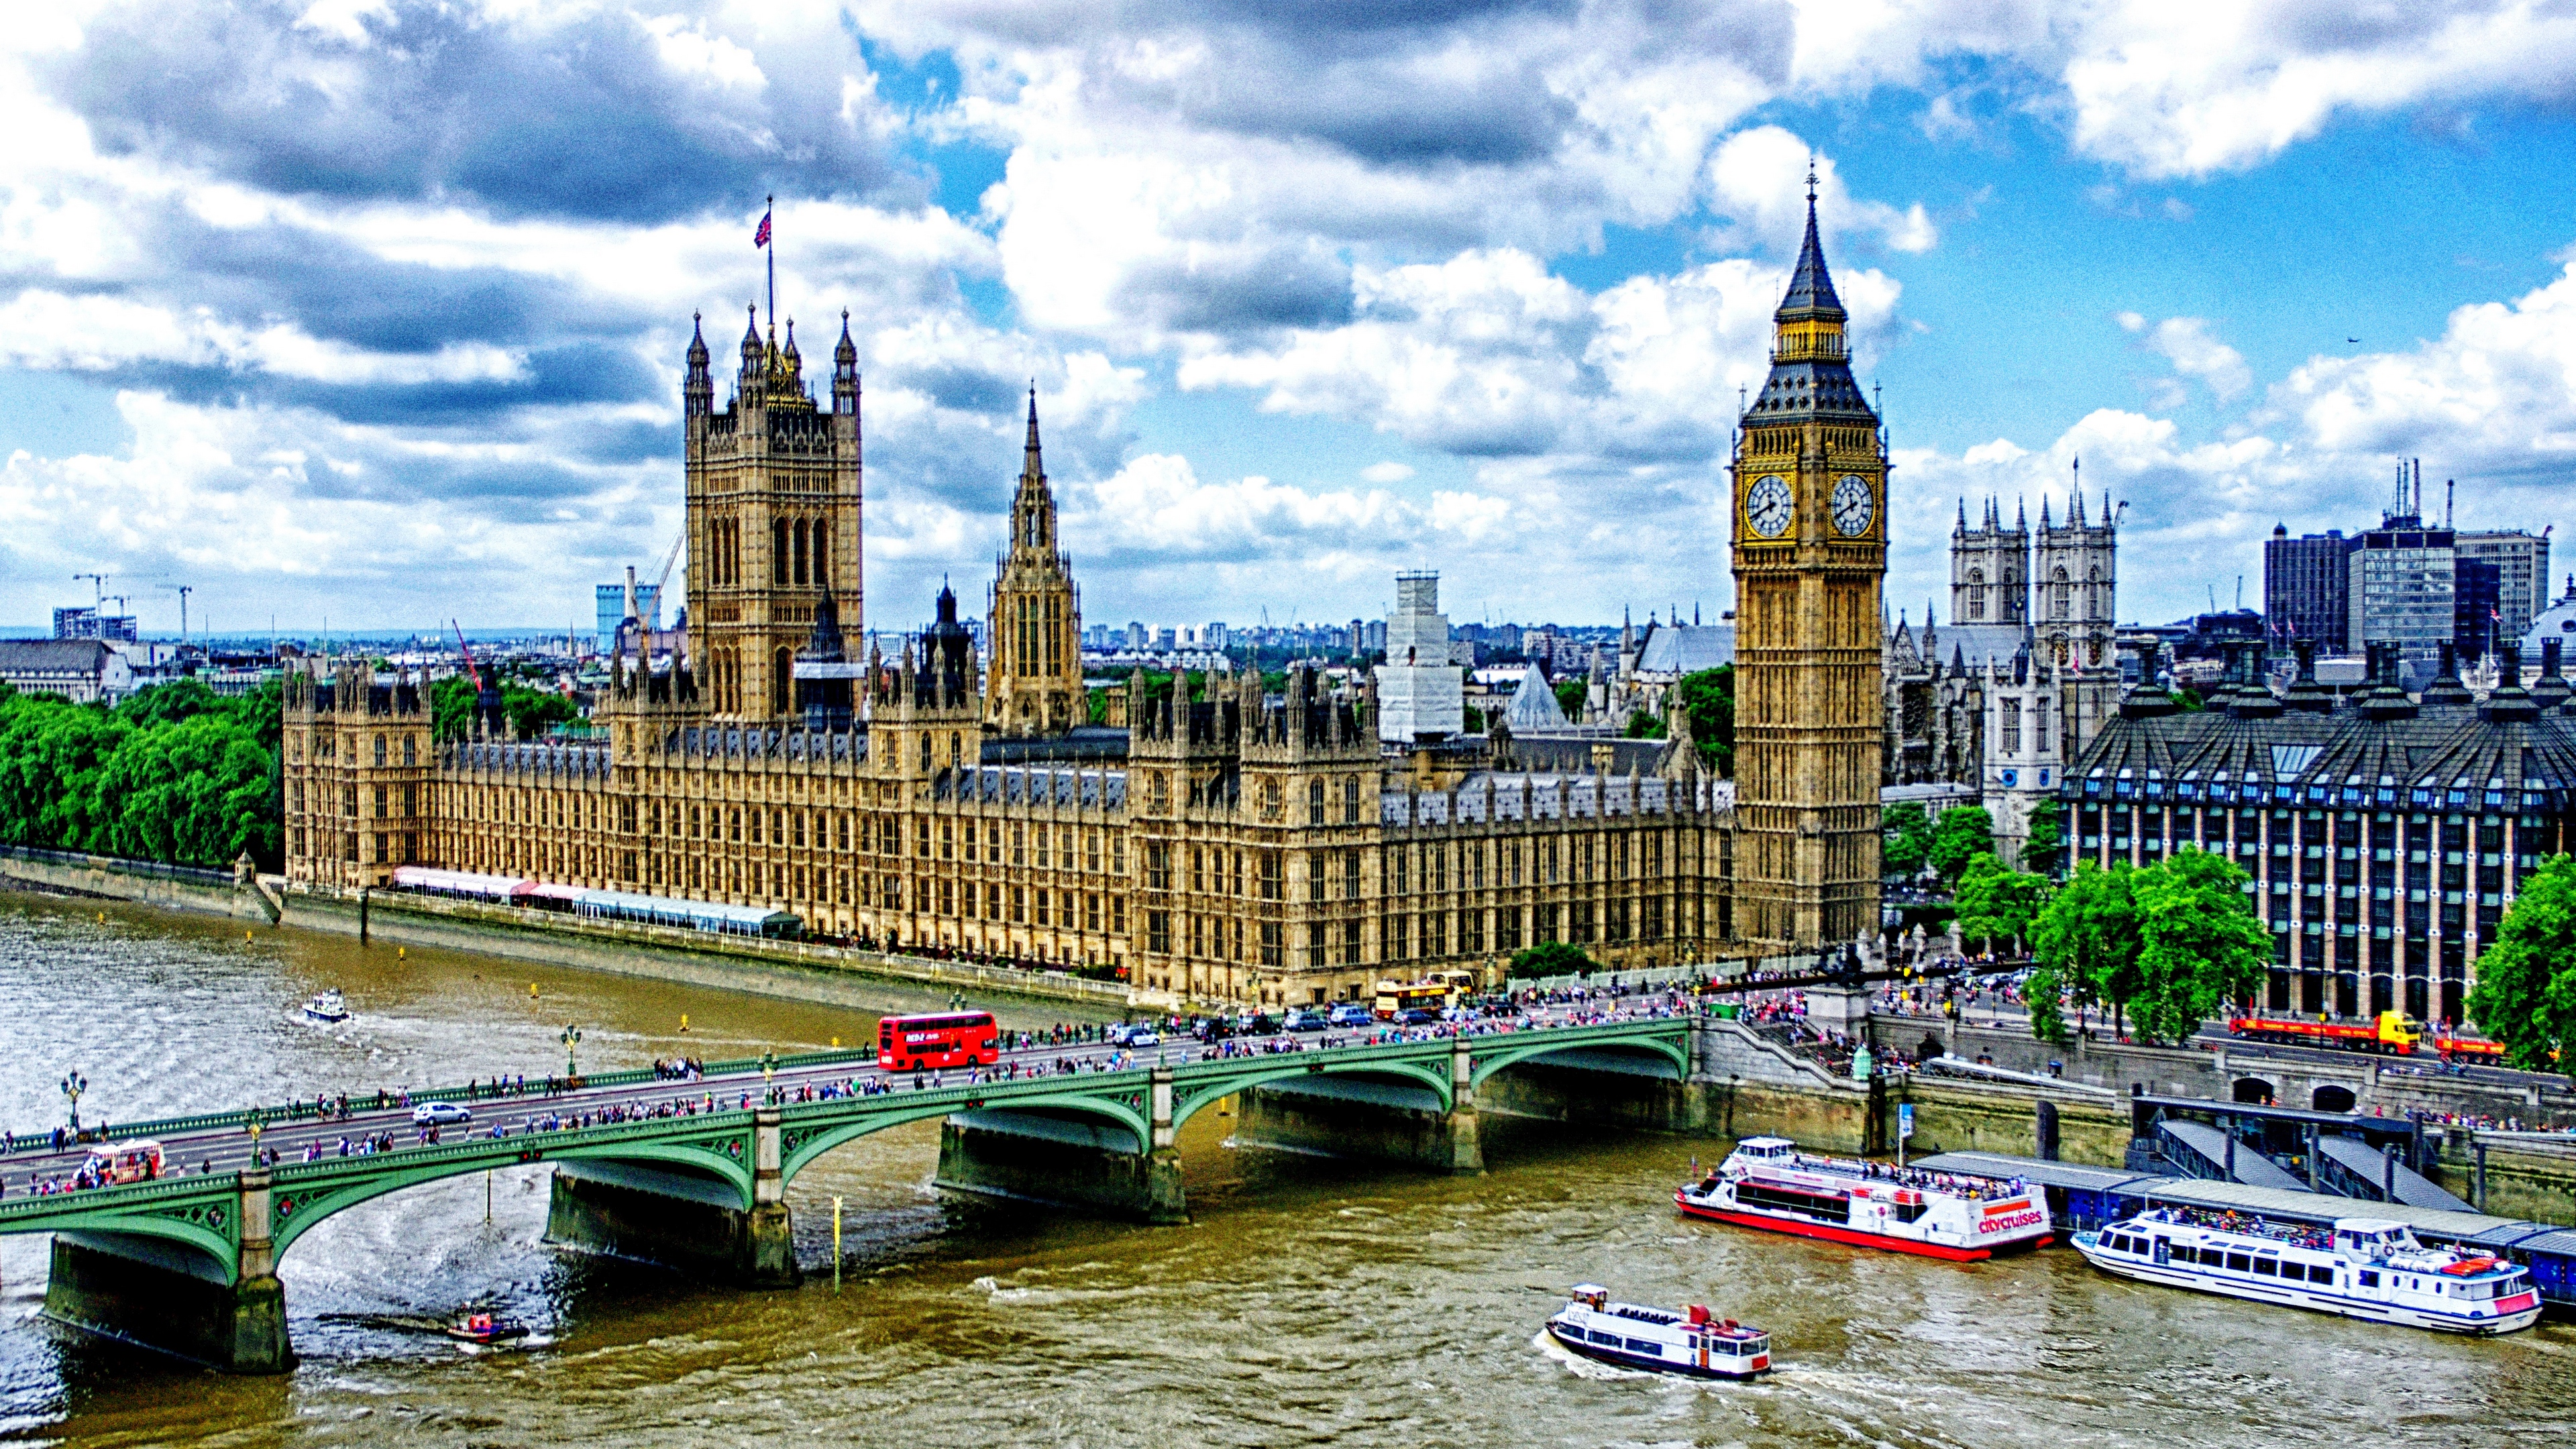 big ben london palace of westminster bridge river thames boats hdr 4k 1538066721 - big ben, london, palace of westminster, bridge, river, thames, boats, hdr 4k - palace of westminster, London, big ben